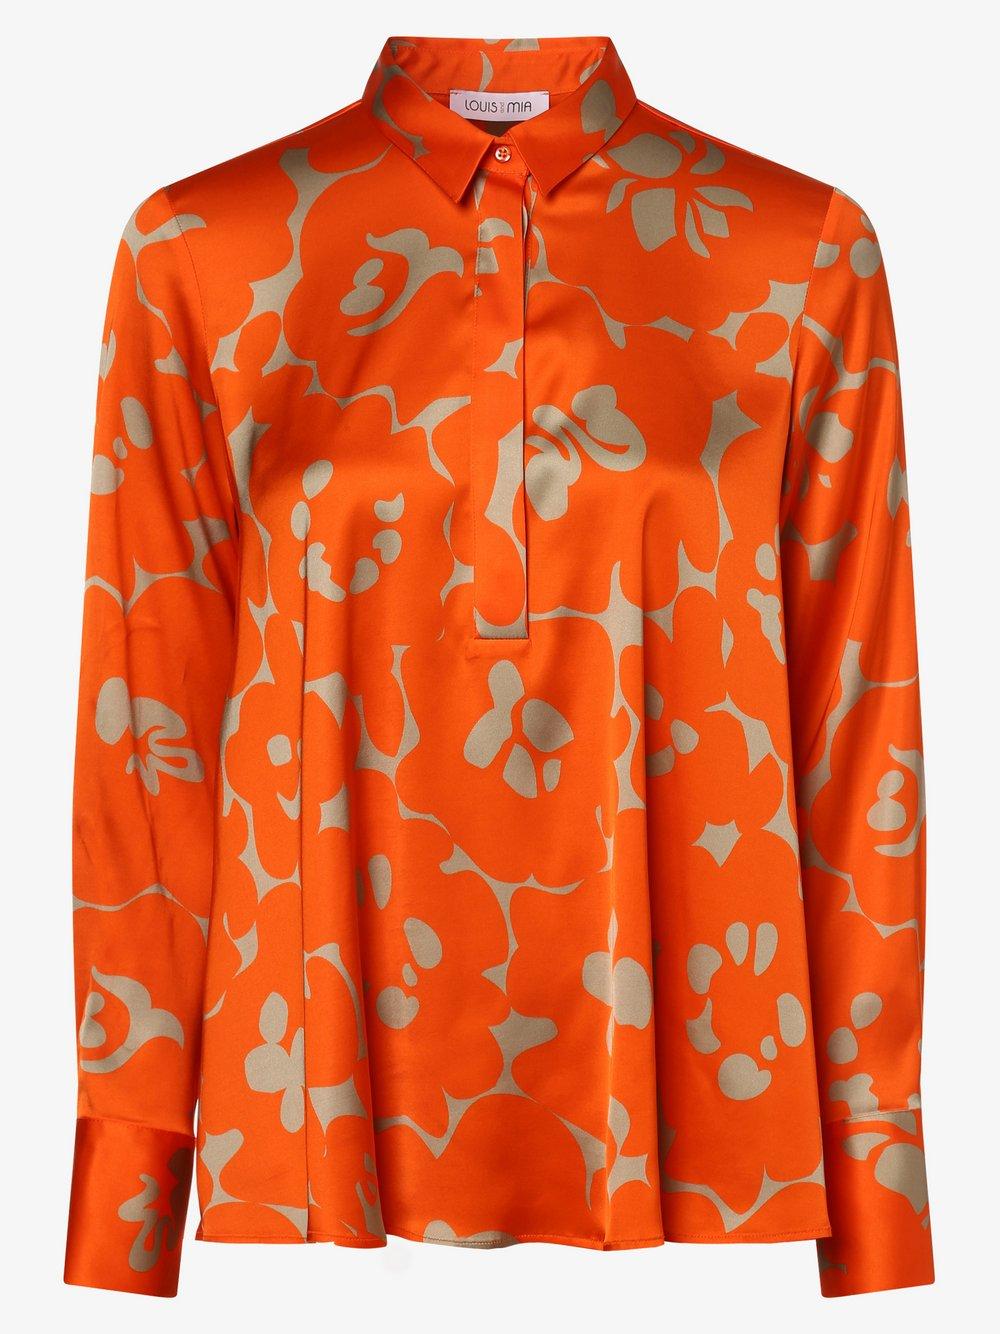 Louis & Mia – Bluzka damska, pomarańczowy Van Graaf 465323-0001-00380